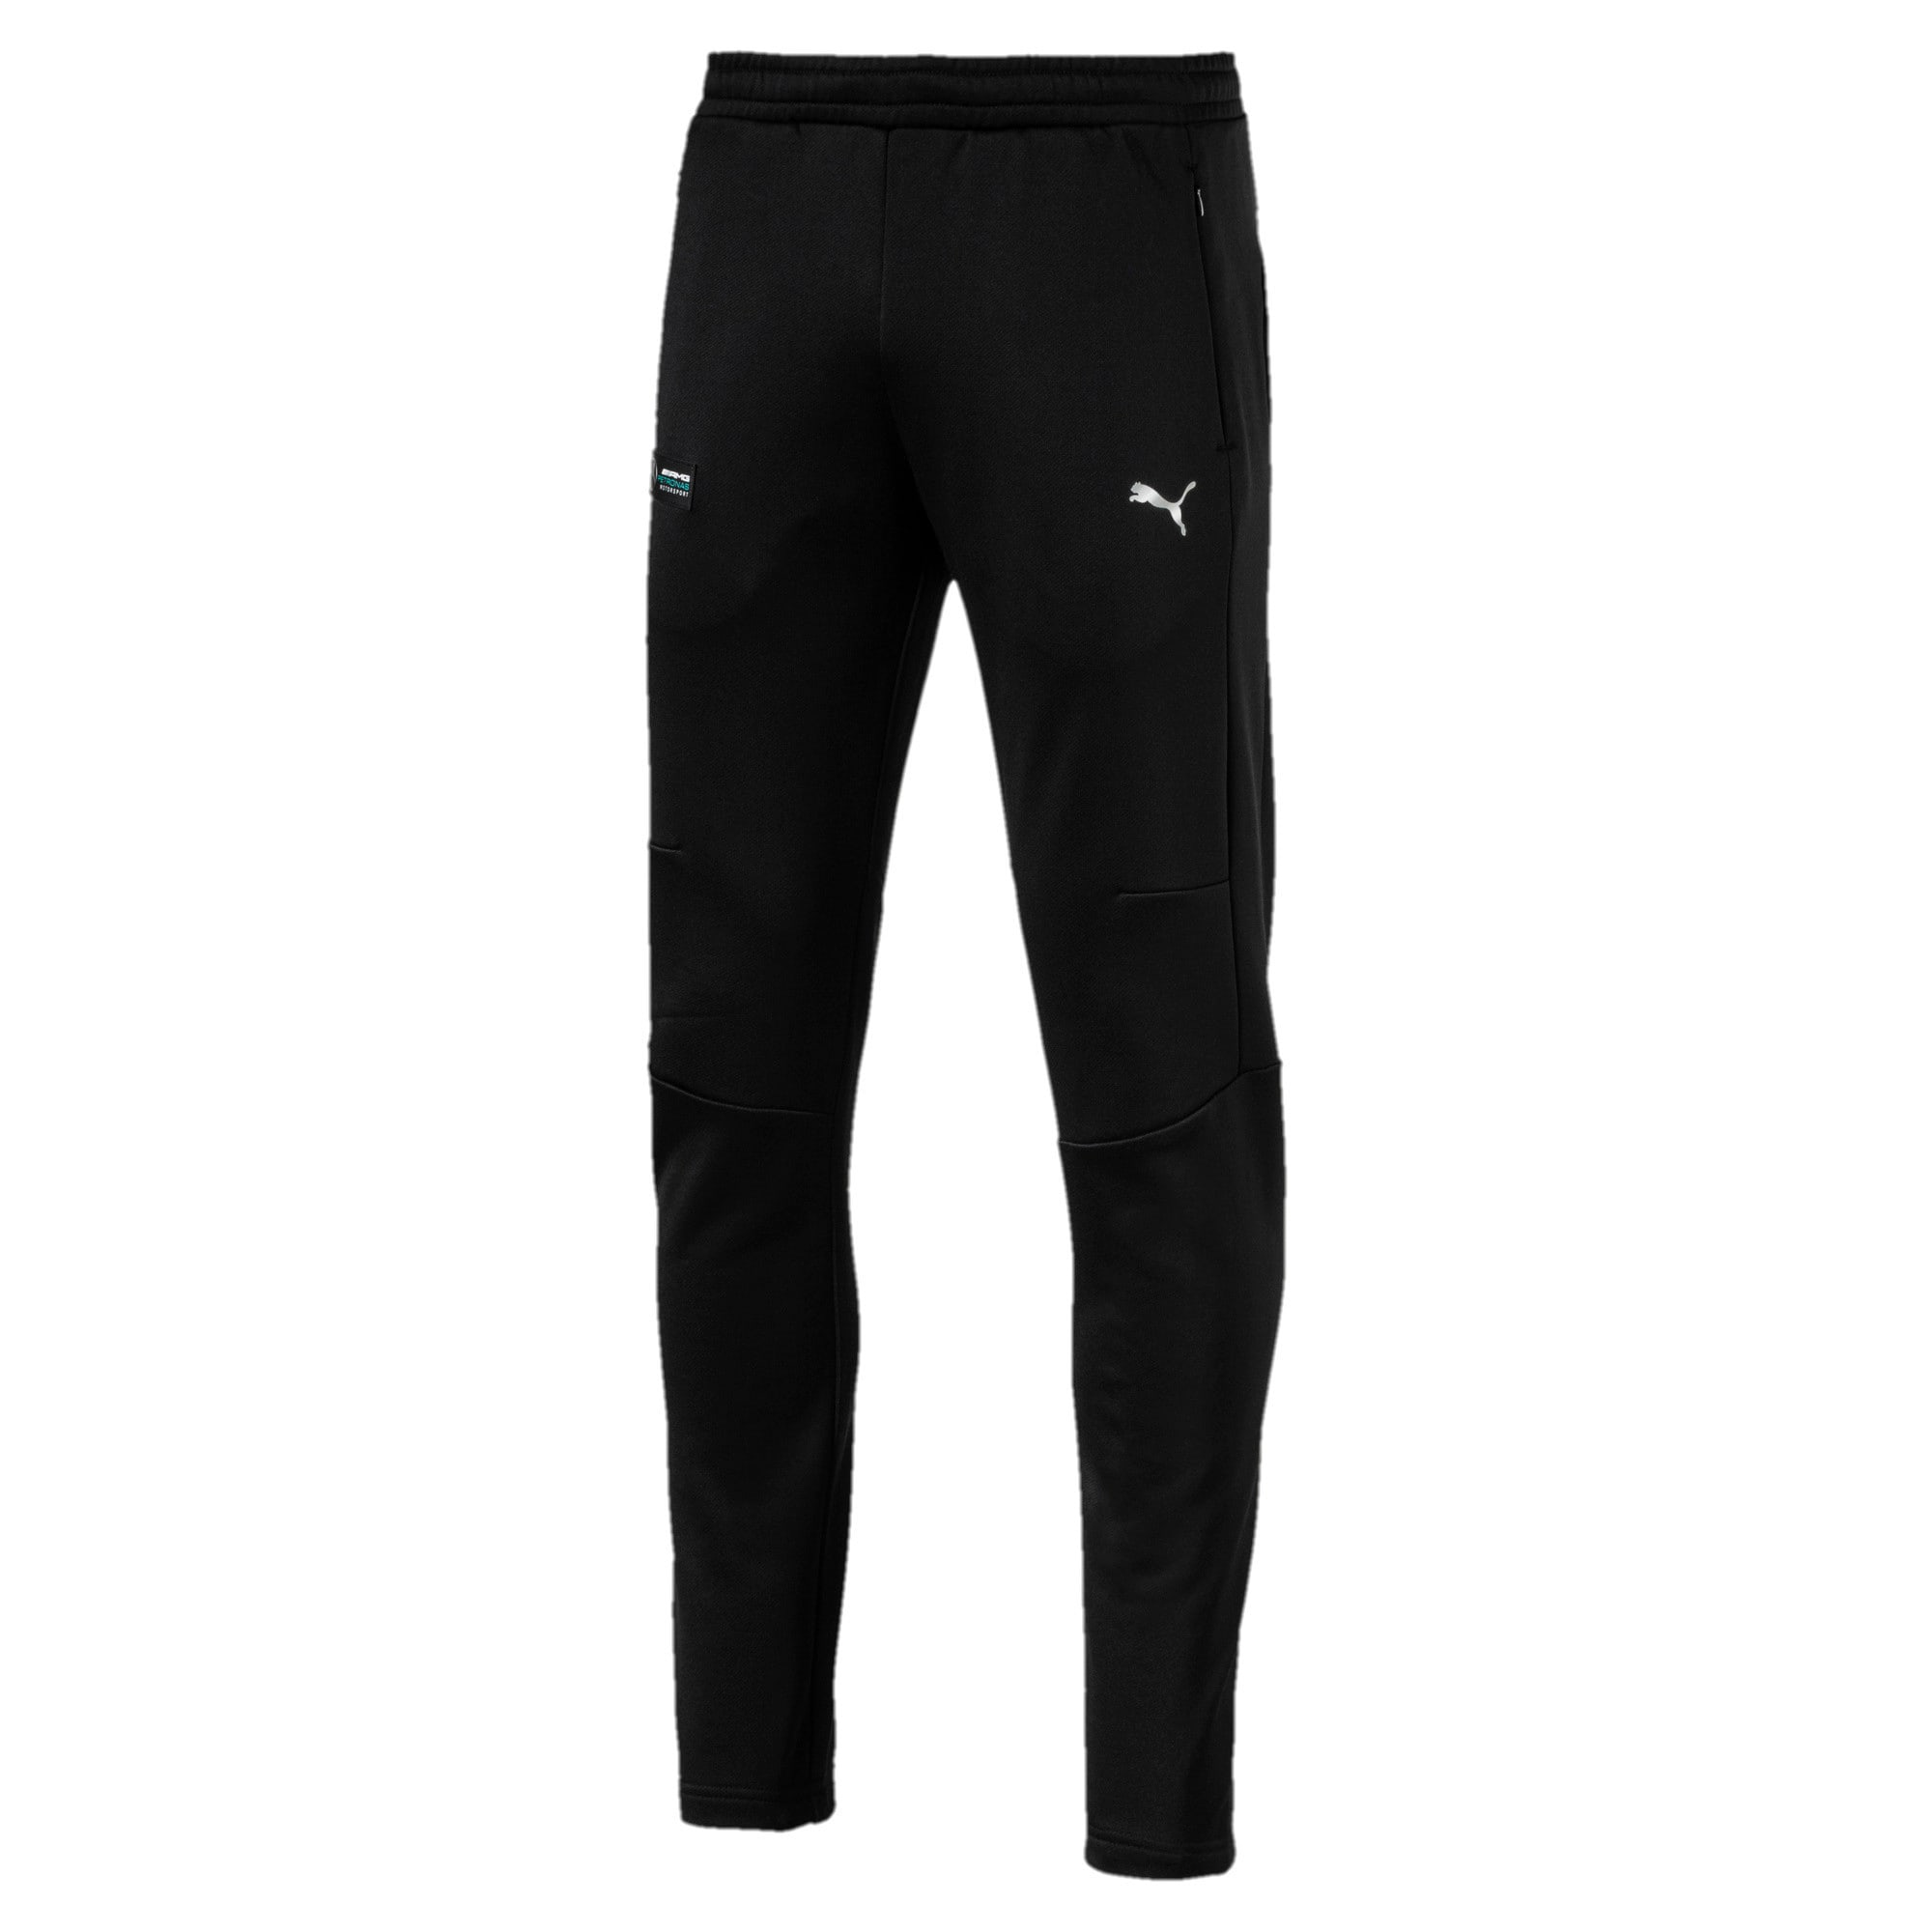 Thumbnail 1 of MERCEDES AMG PETRONAS Men's T7 Track Pants, Puma Black, medium-IND